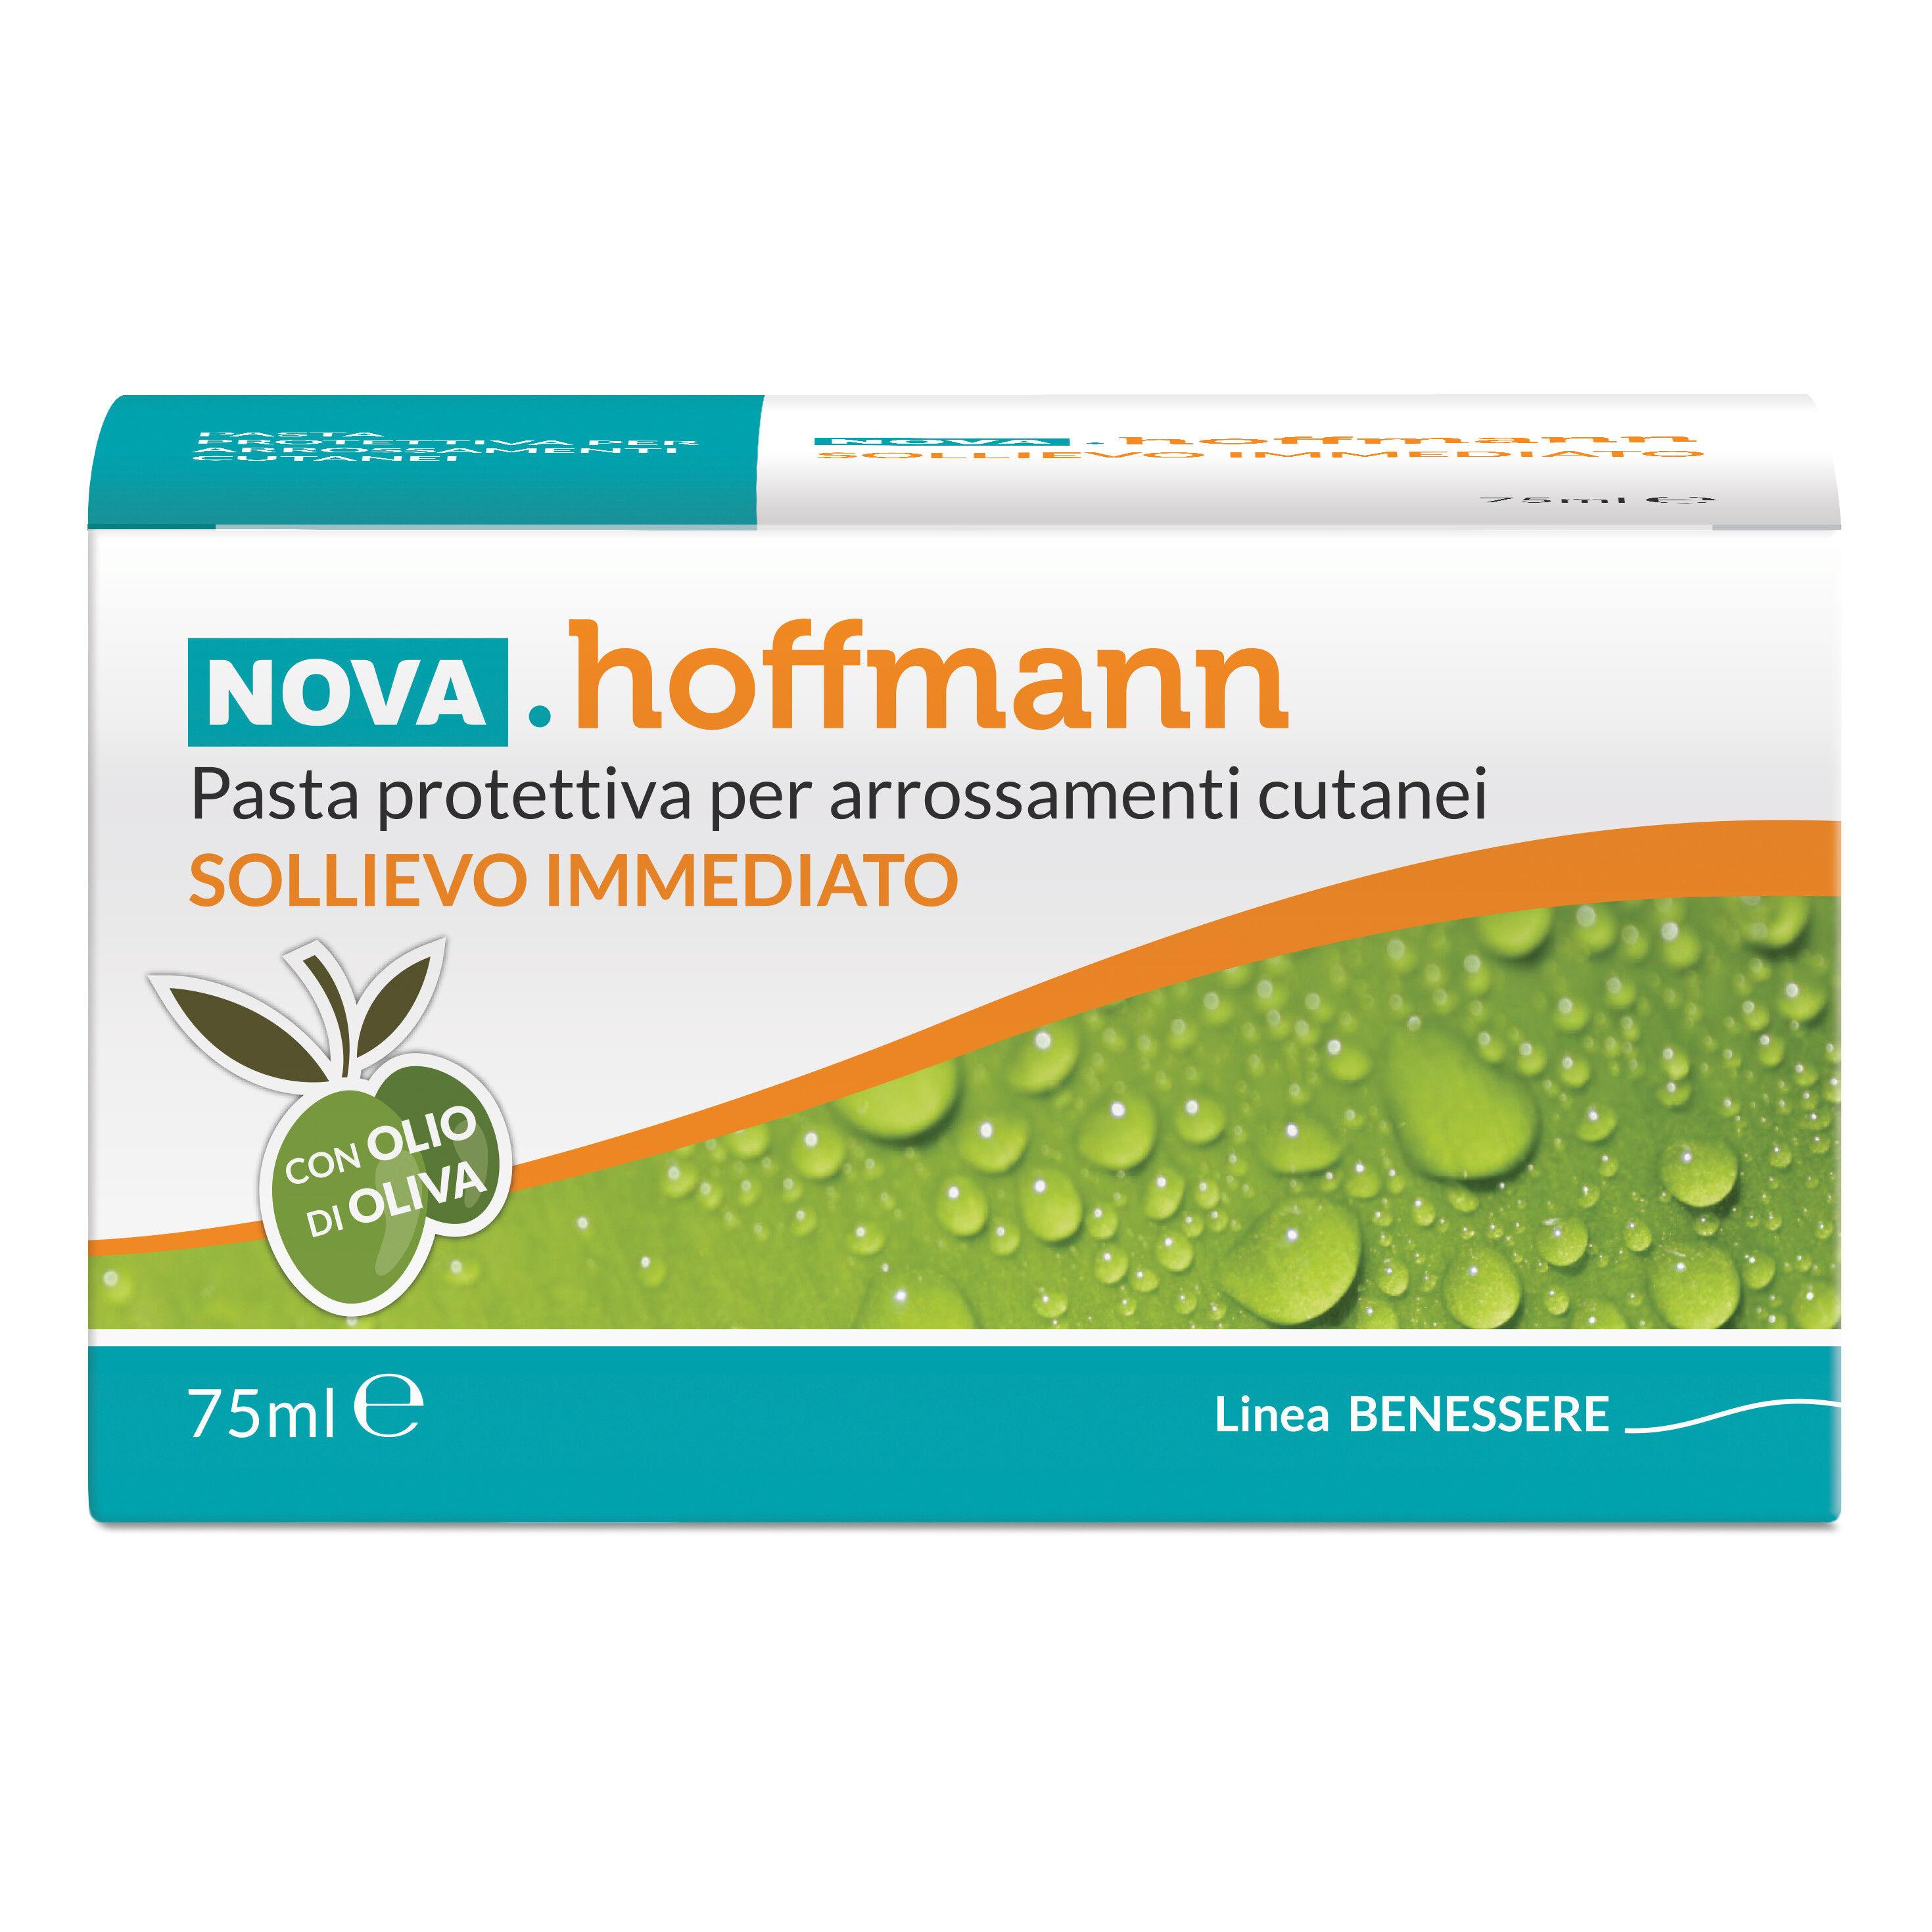 Nova Argentia Srl Ind. Farm Nova Hoffmann Crema 75ml